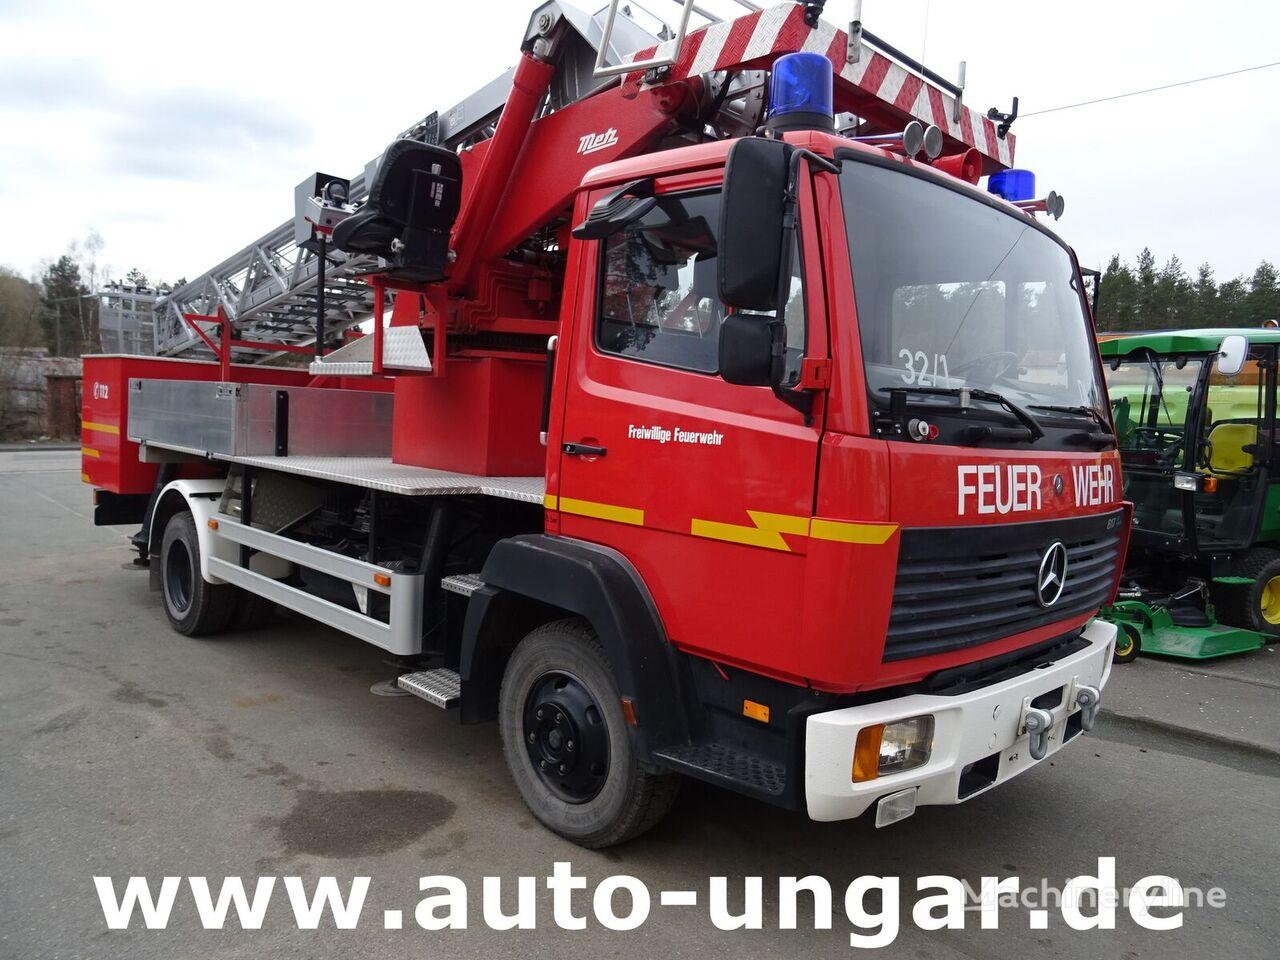 пожарная автолестница MERCEDES-BENZ 817 F DLK 12-9 SE